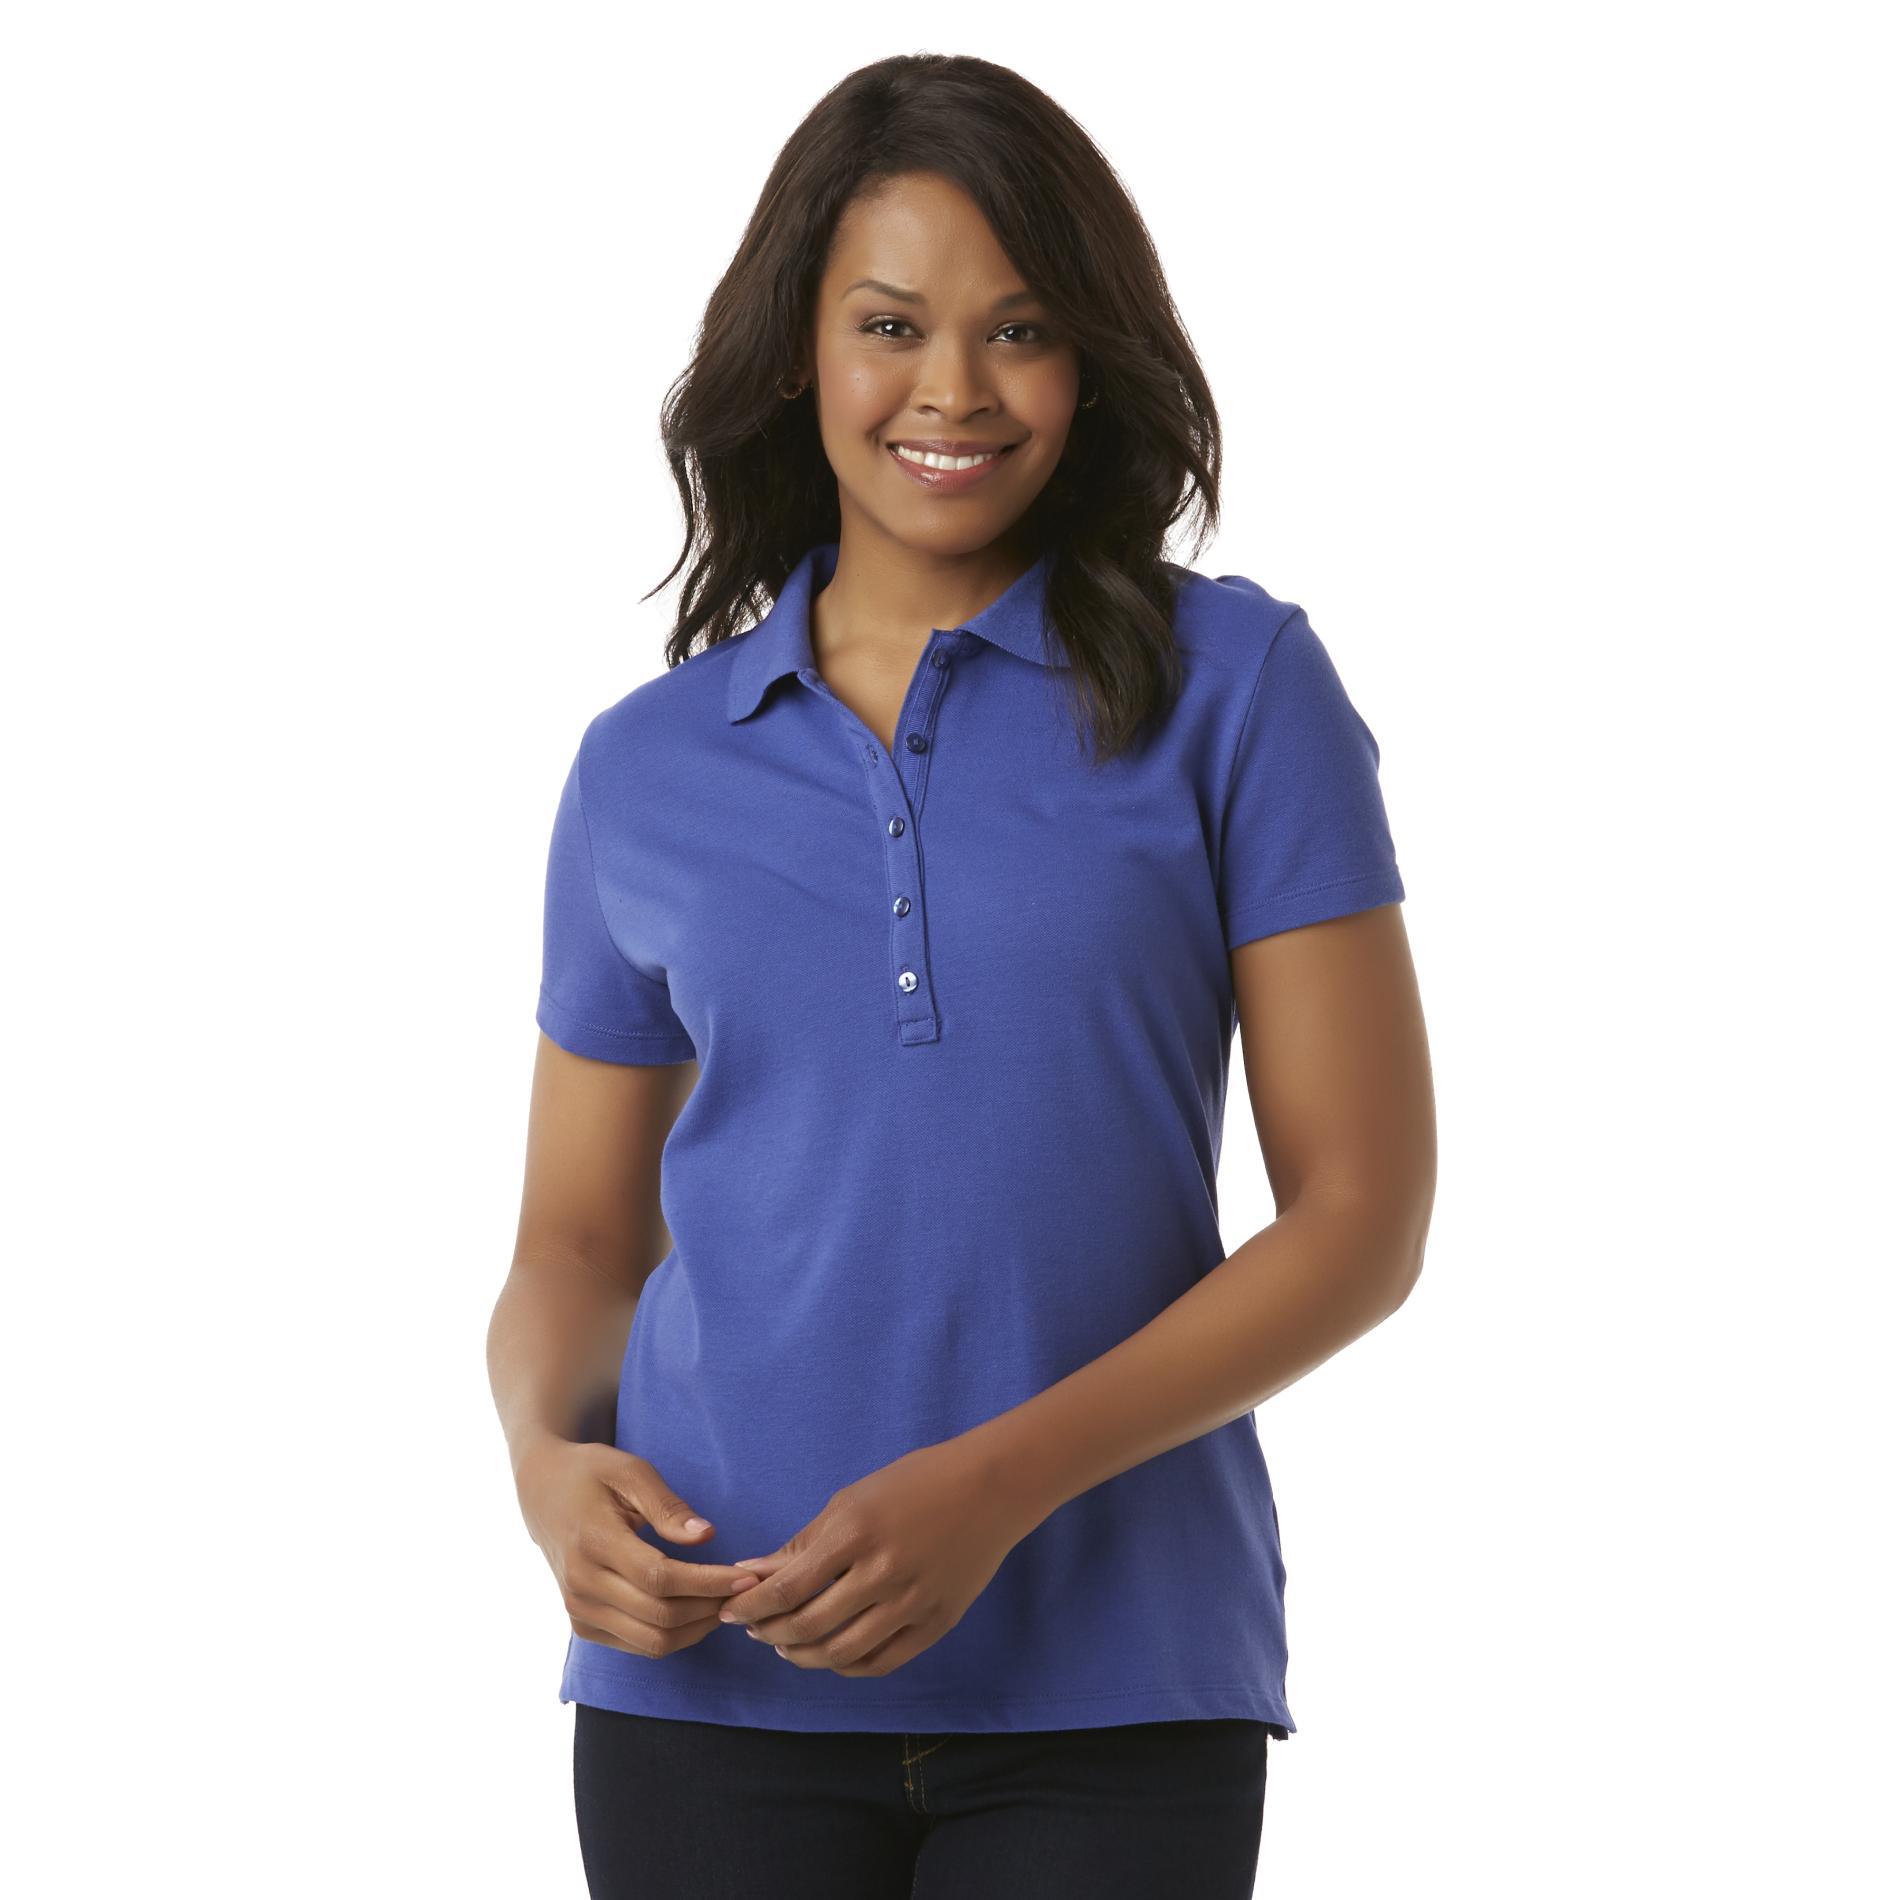 womens polo shirts basic editions womenu0027s polo shirt bxjjzcr